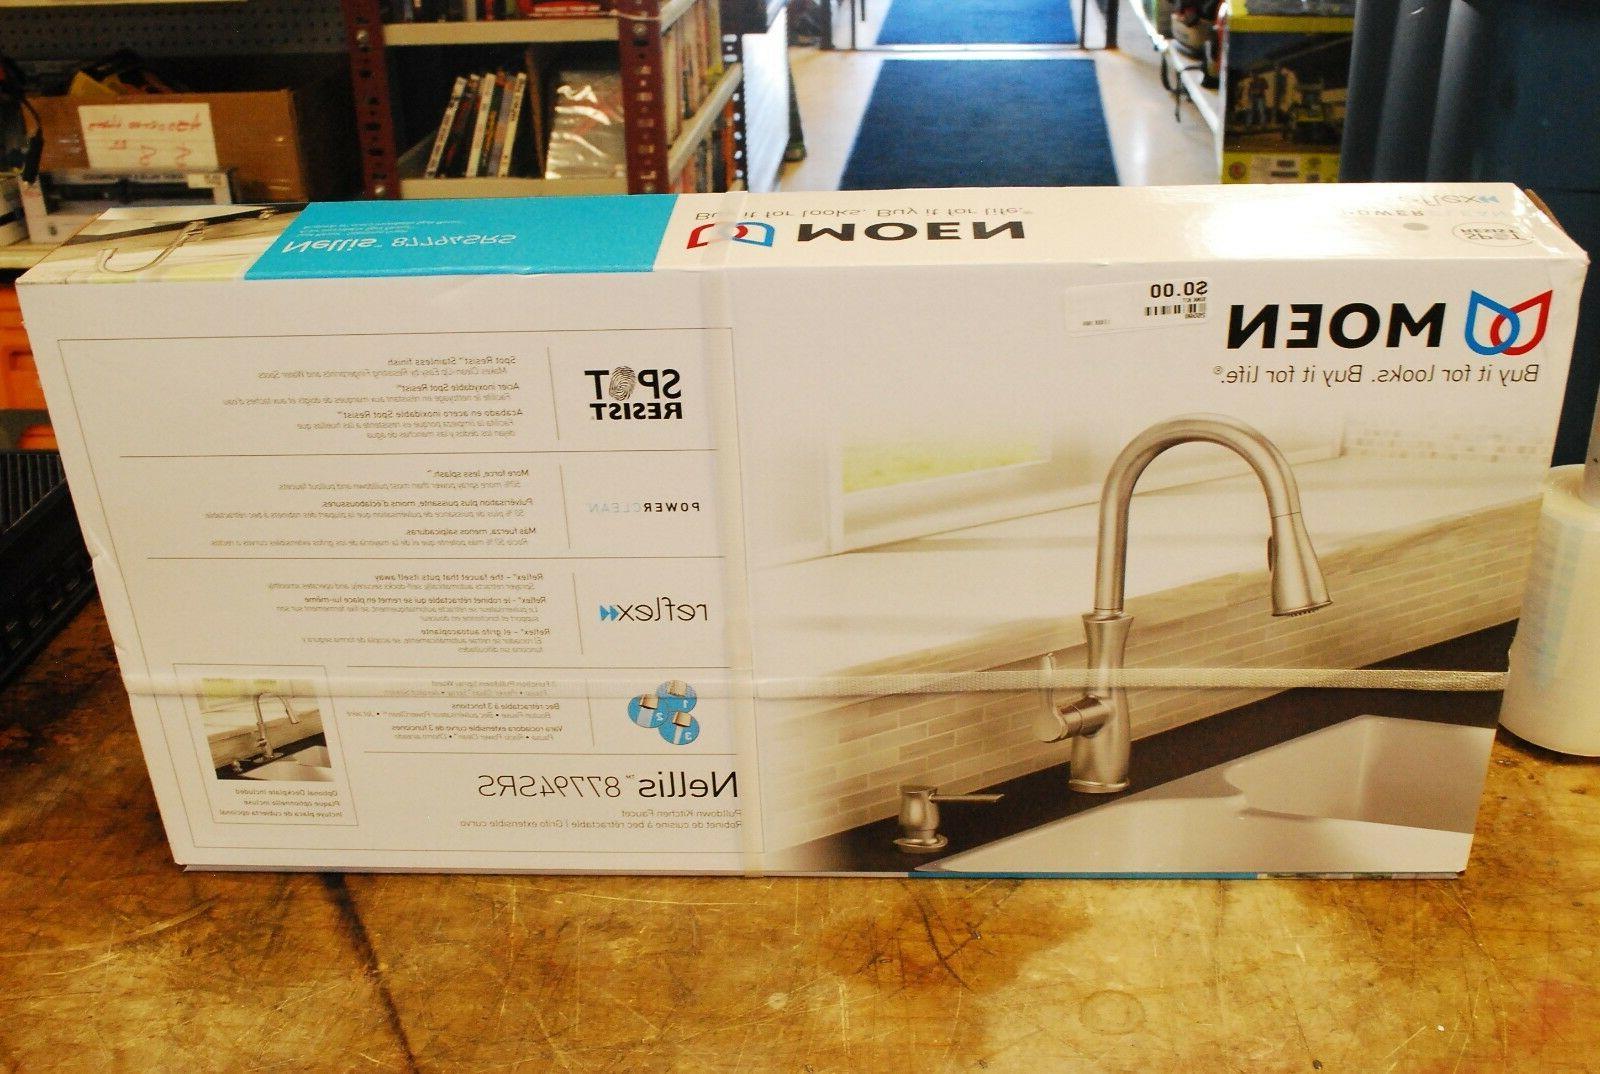 nellis single handle pull down sprayer kitchen